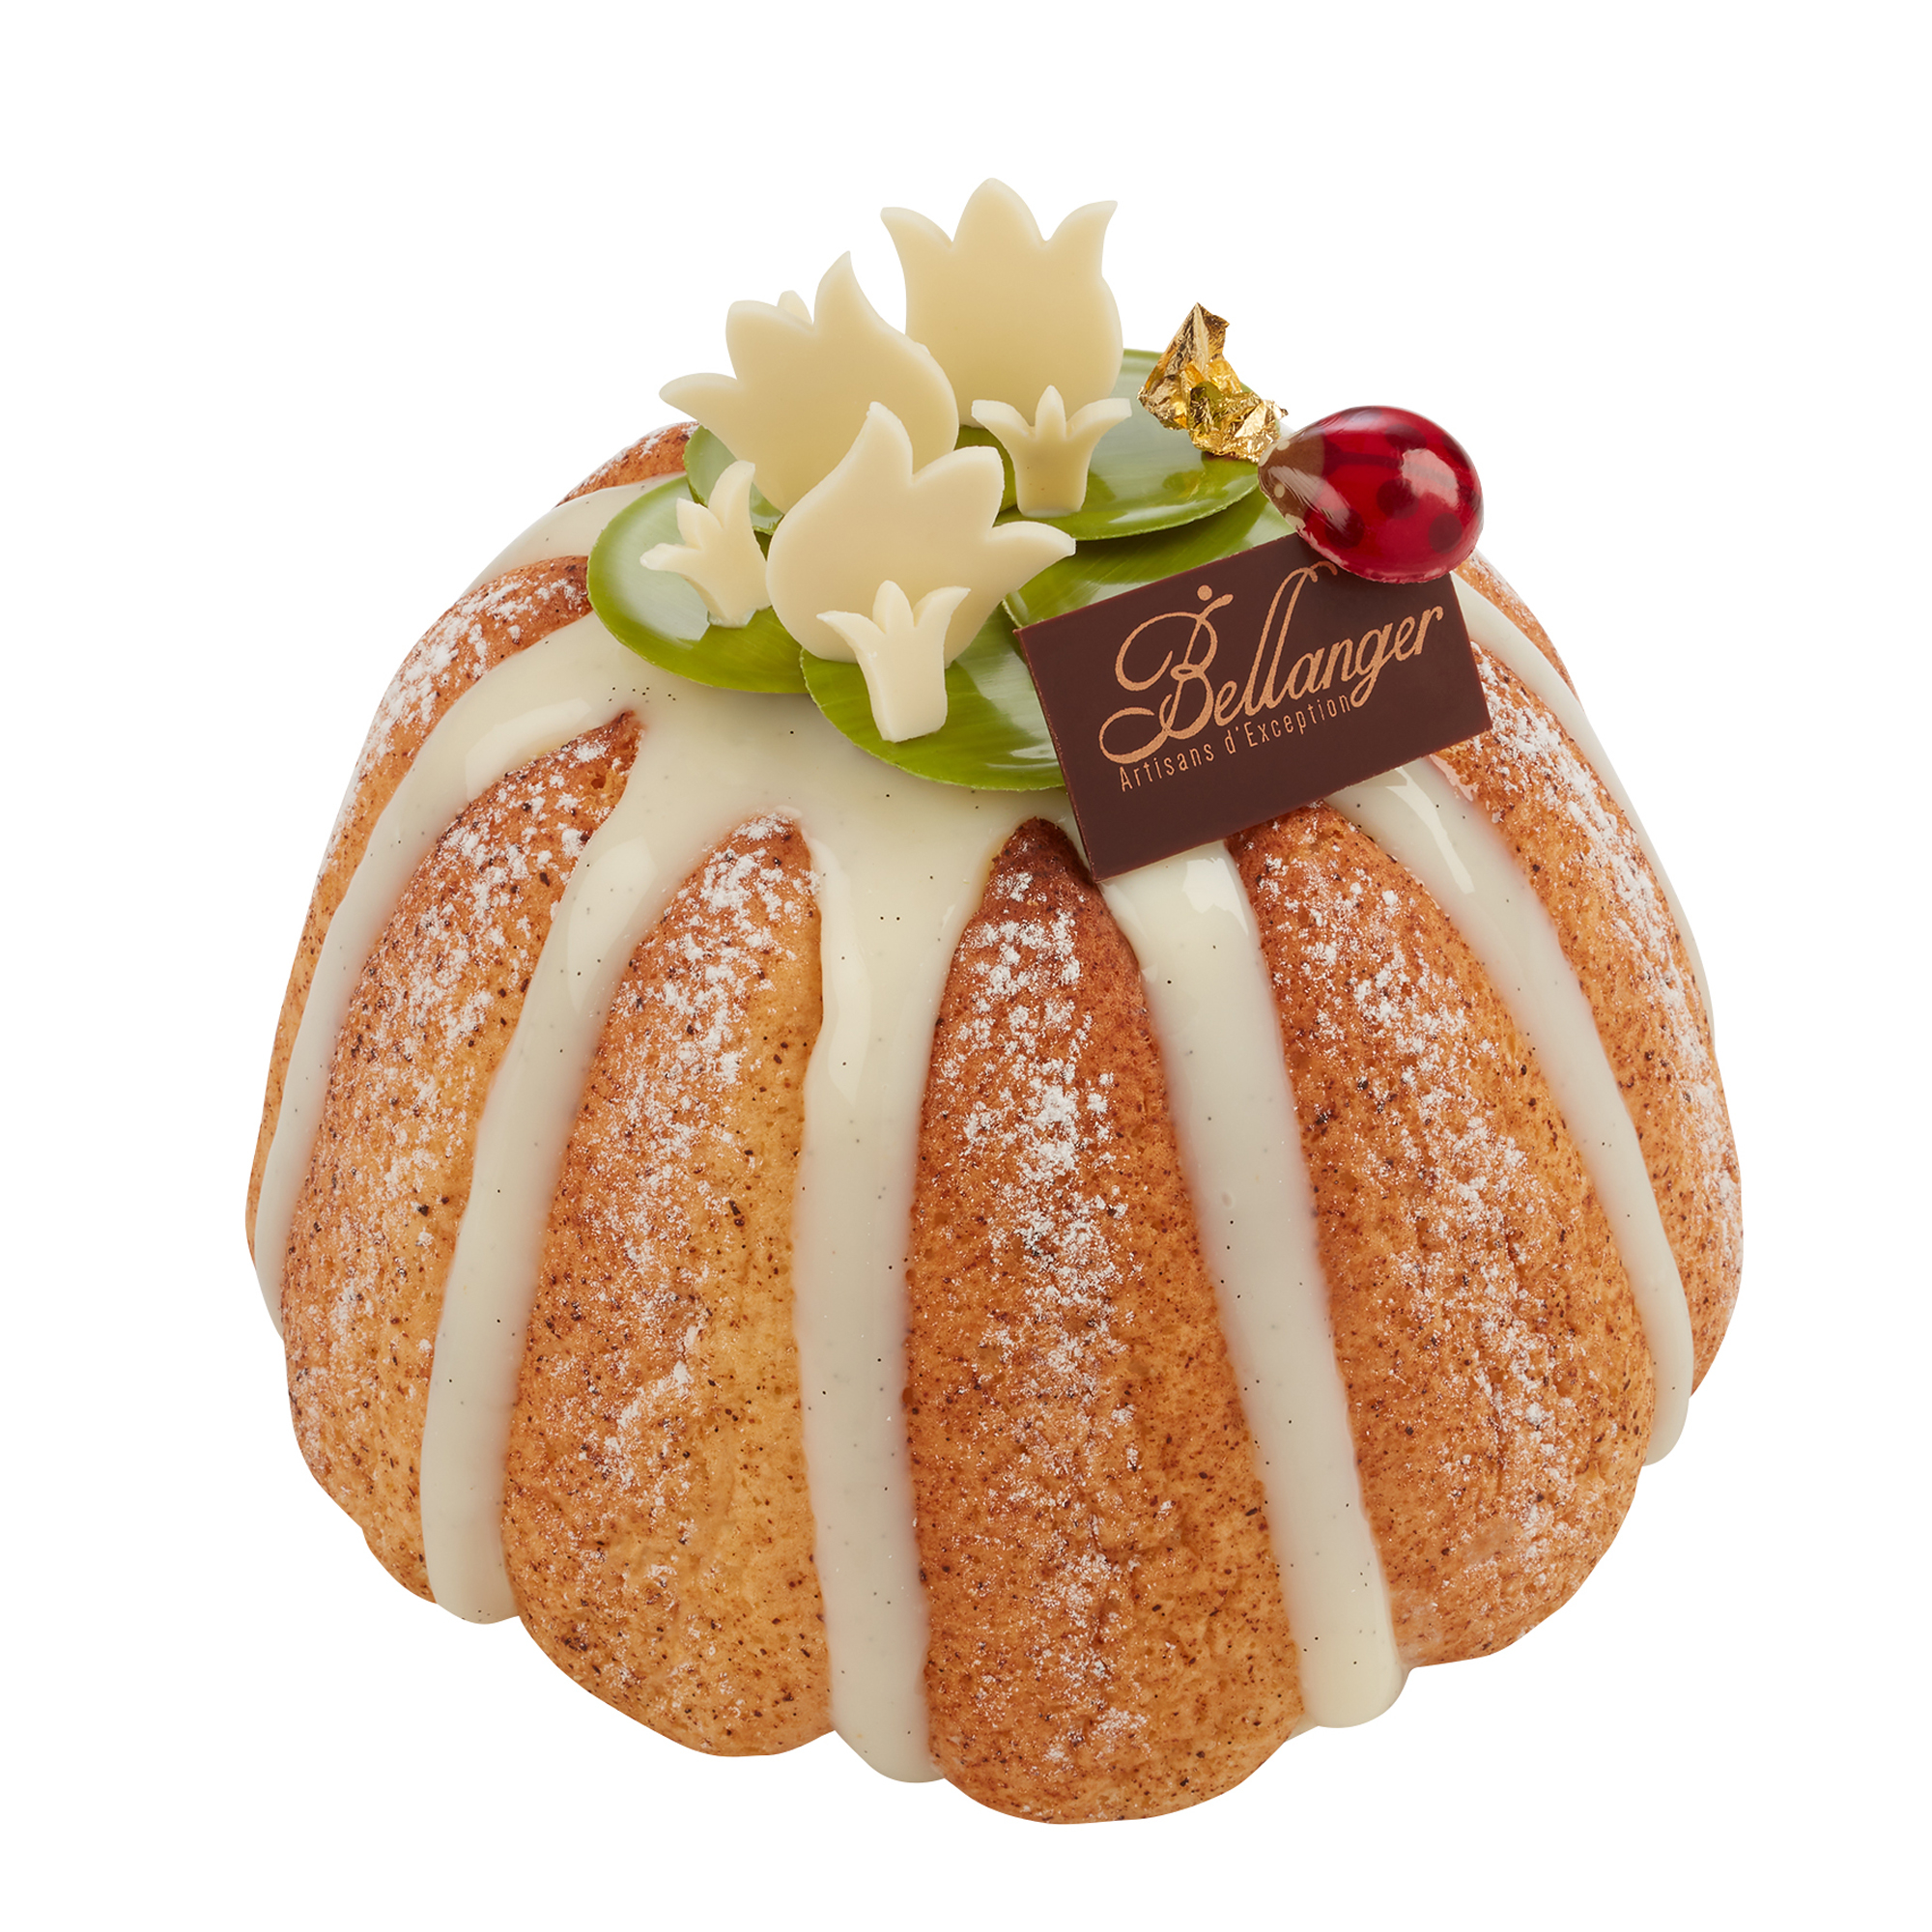 charlotte-du-printemps-chocolat-bellanger